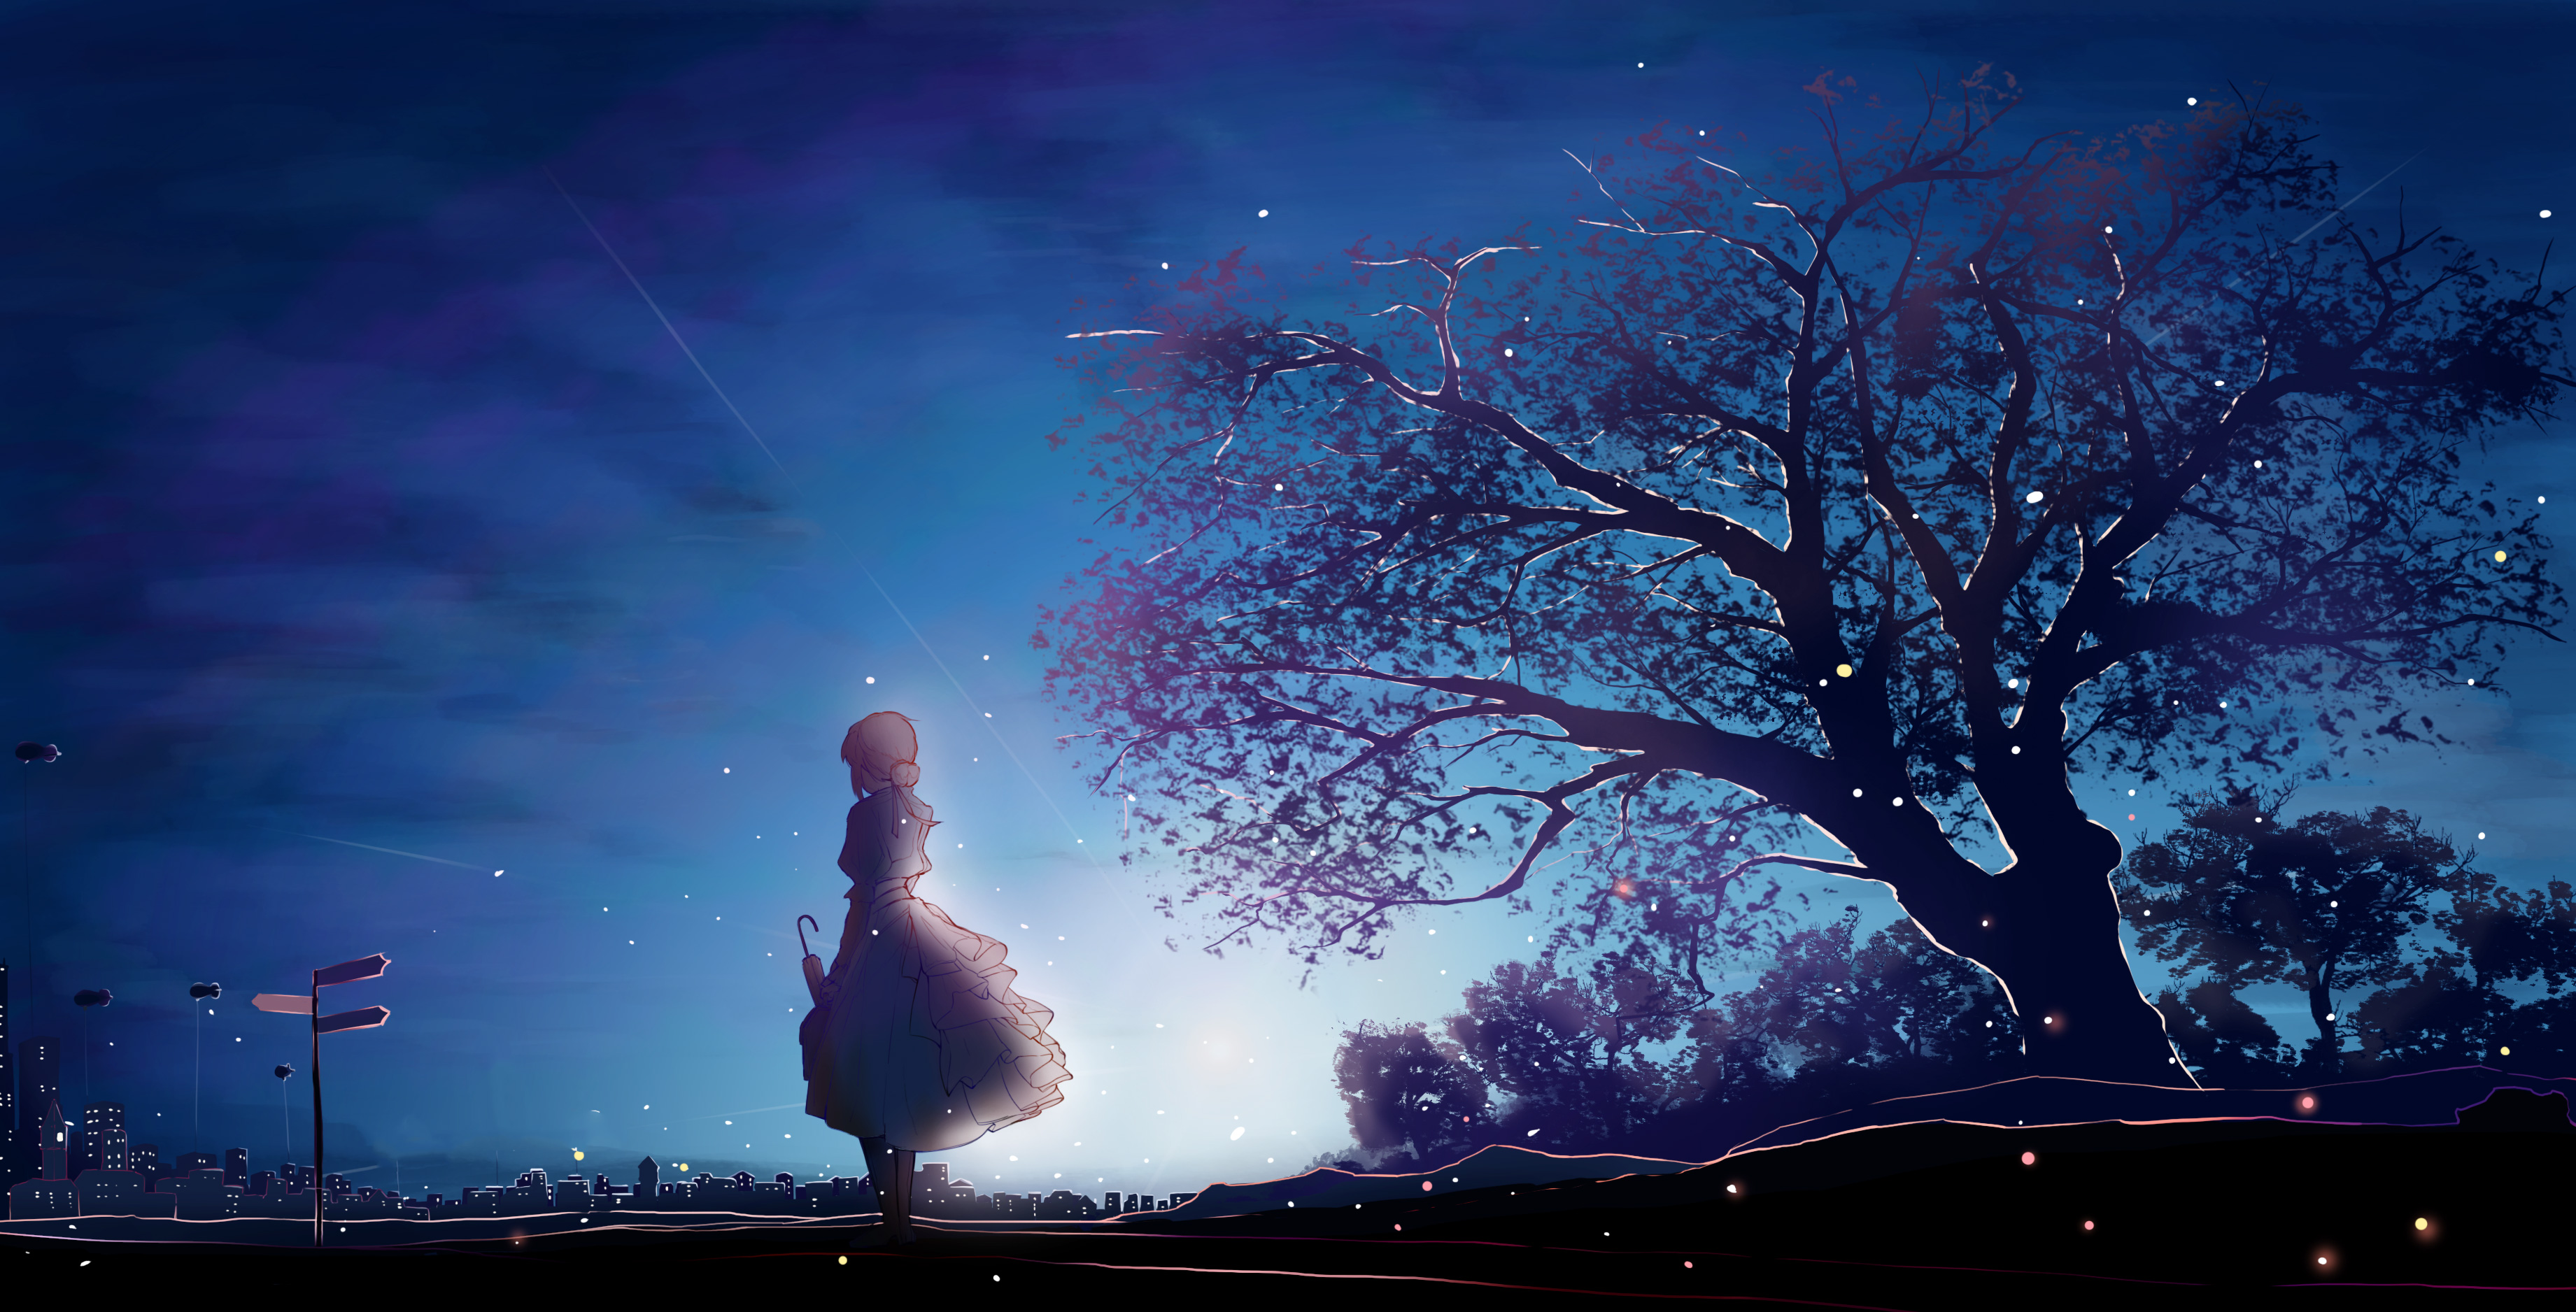 Violet Evergarden 4k, HD Anime, 4k Wallpapers, Images